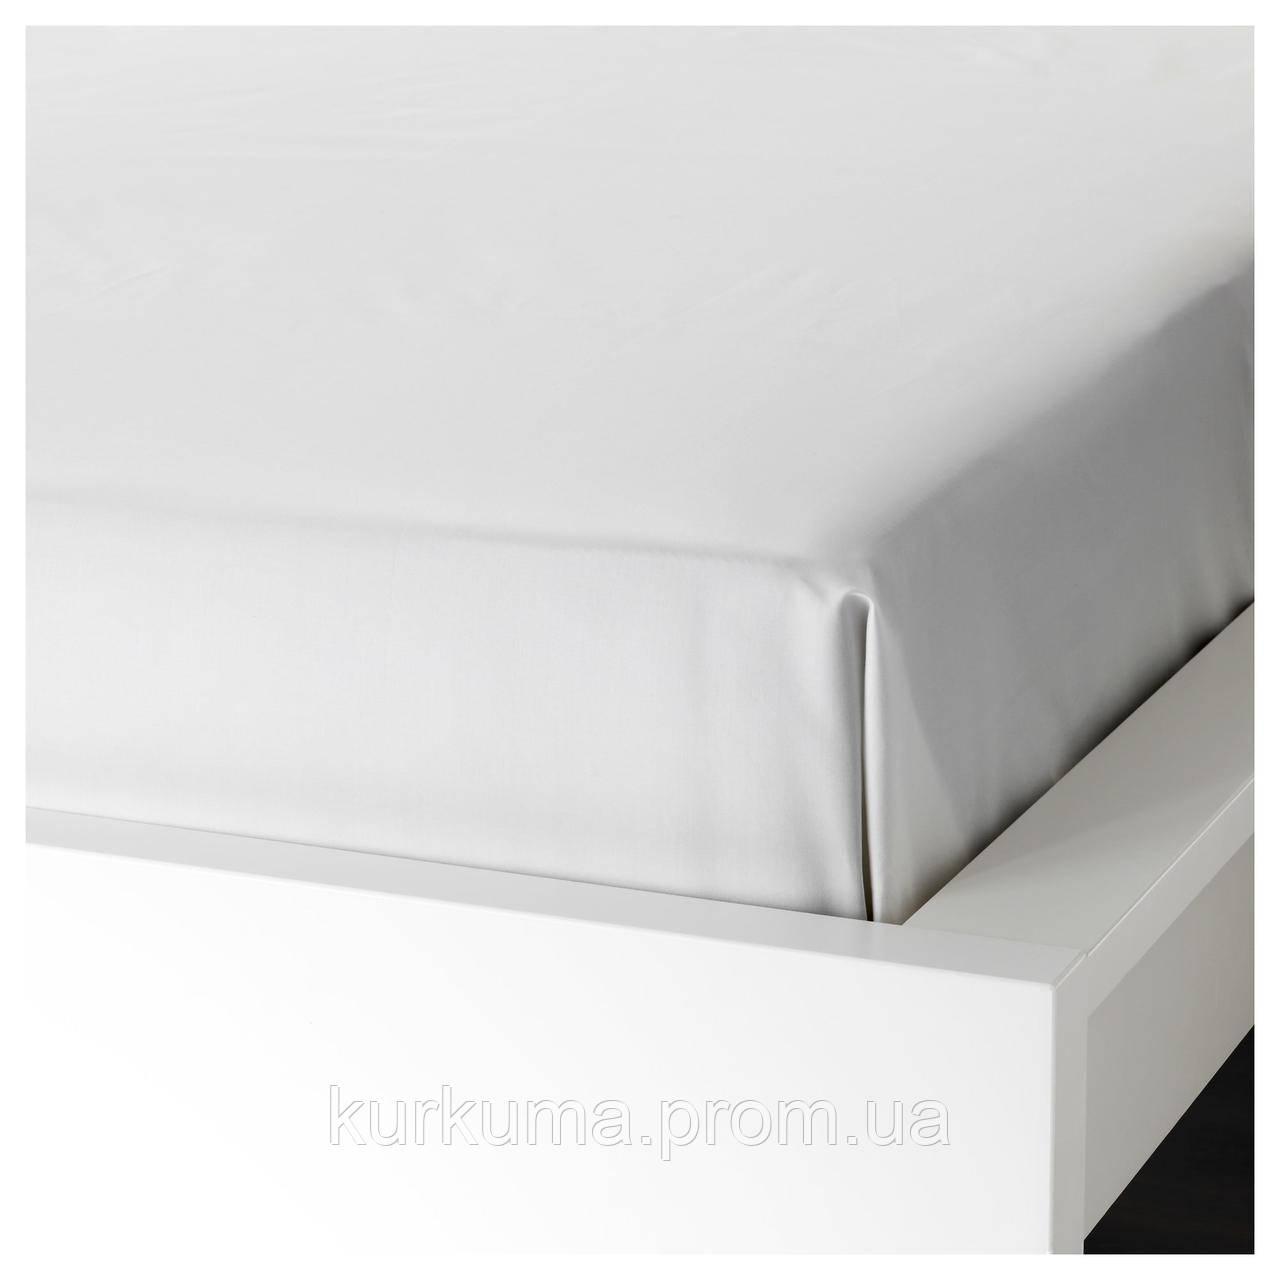 IKEA SOMNTUTA Простыня, белый  (103.145.14)